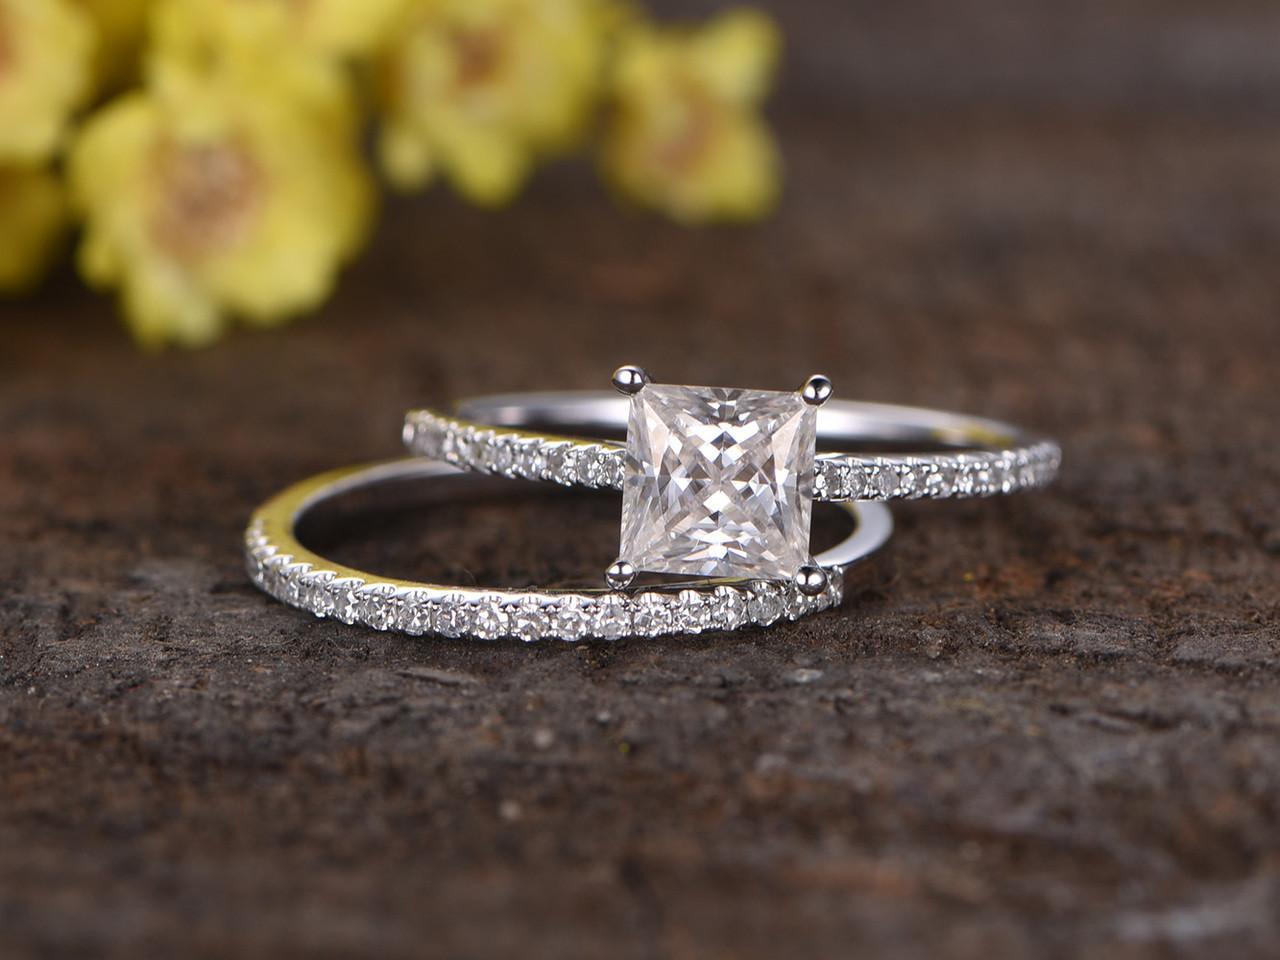 1 Carat Princess Cut Moissanite Engagement Ring Set Diamond Wedding Band 14k White Gold Art Deco Half Eternity Bbbgem